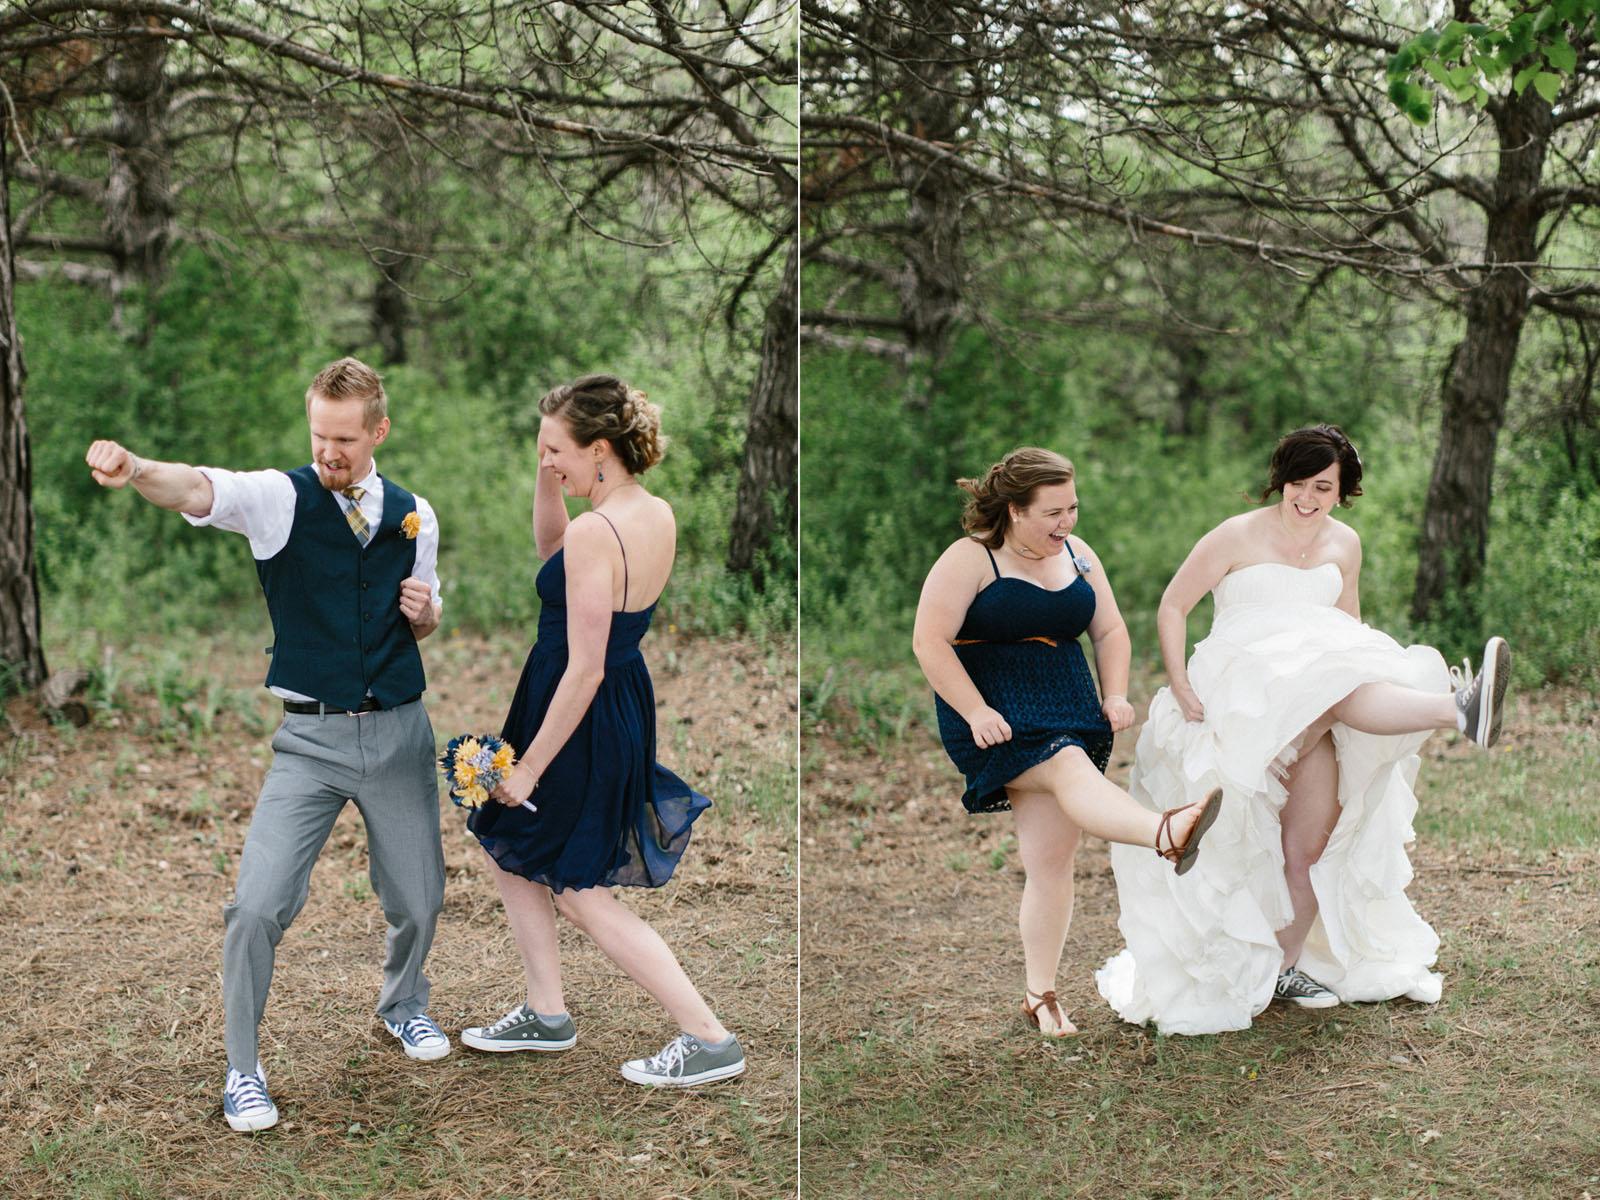 DesMoines_Wedding_Photographer_Spencer&Amanda_045.jpg